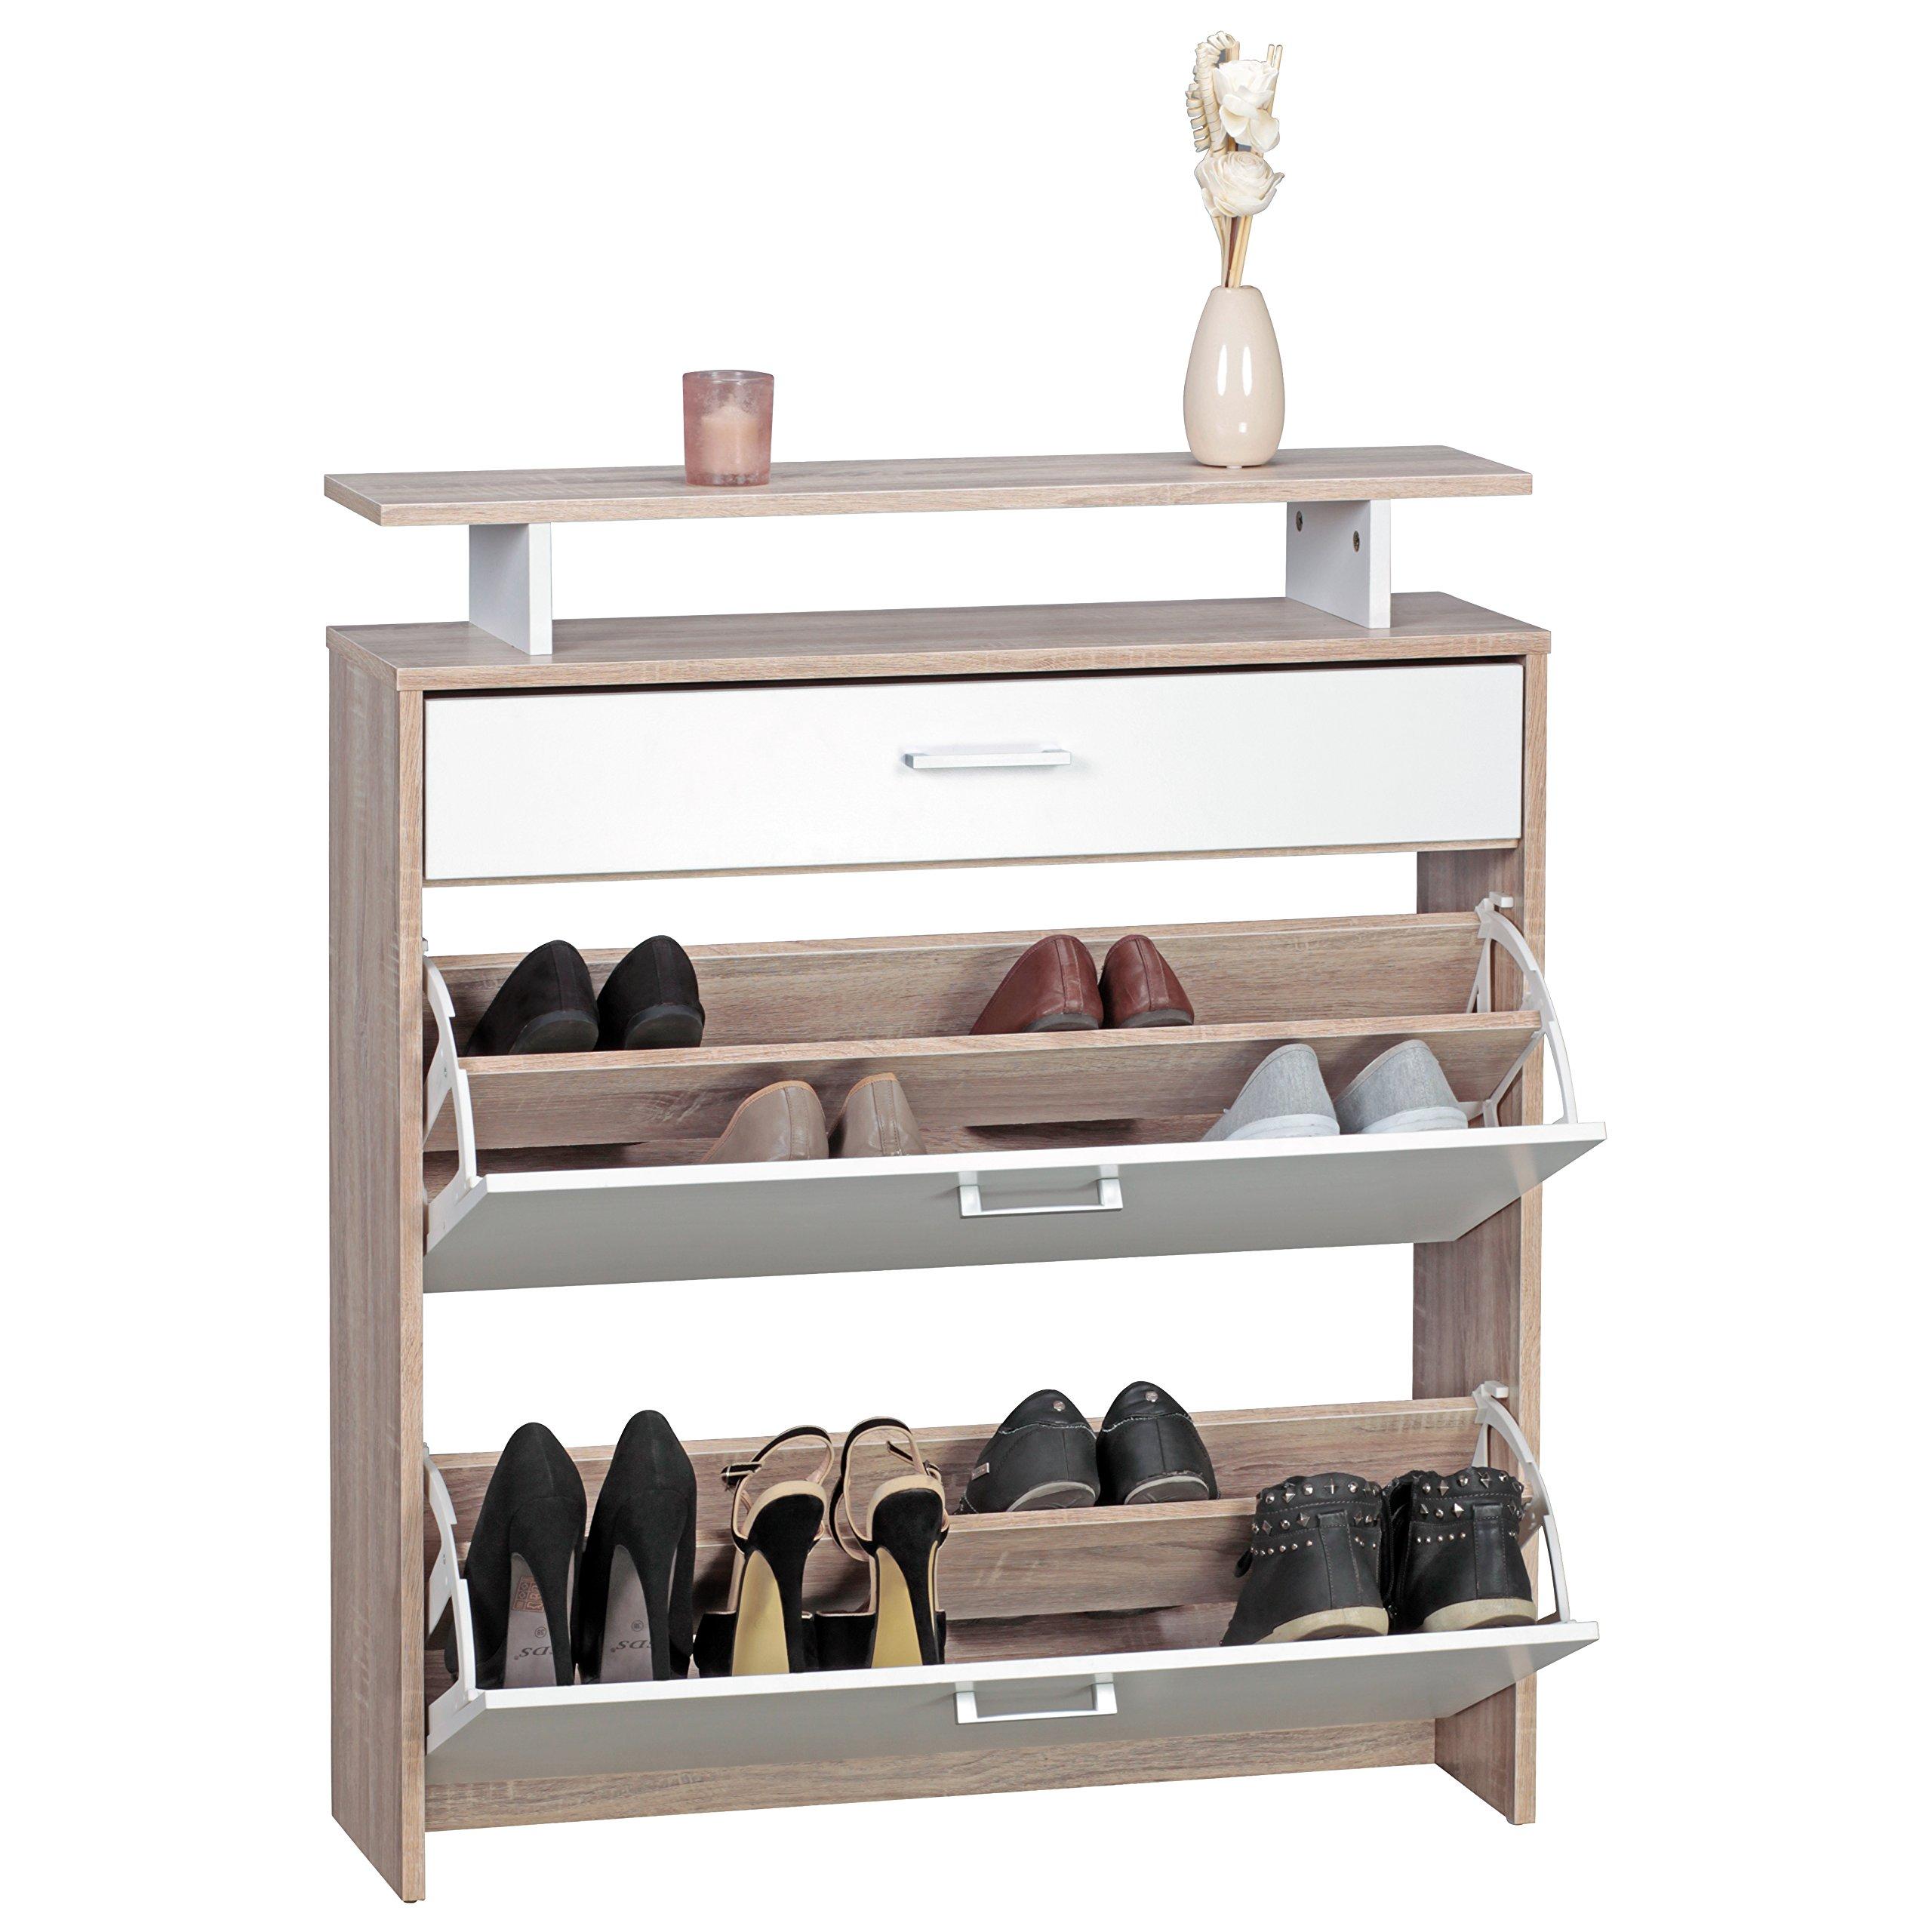 Kommode Schuhe: Amazon.de